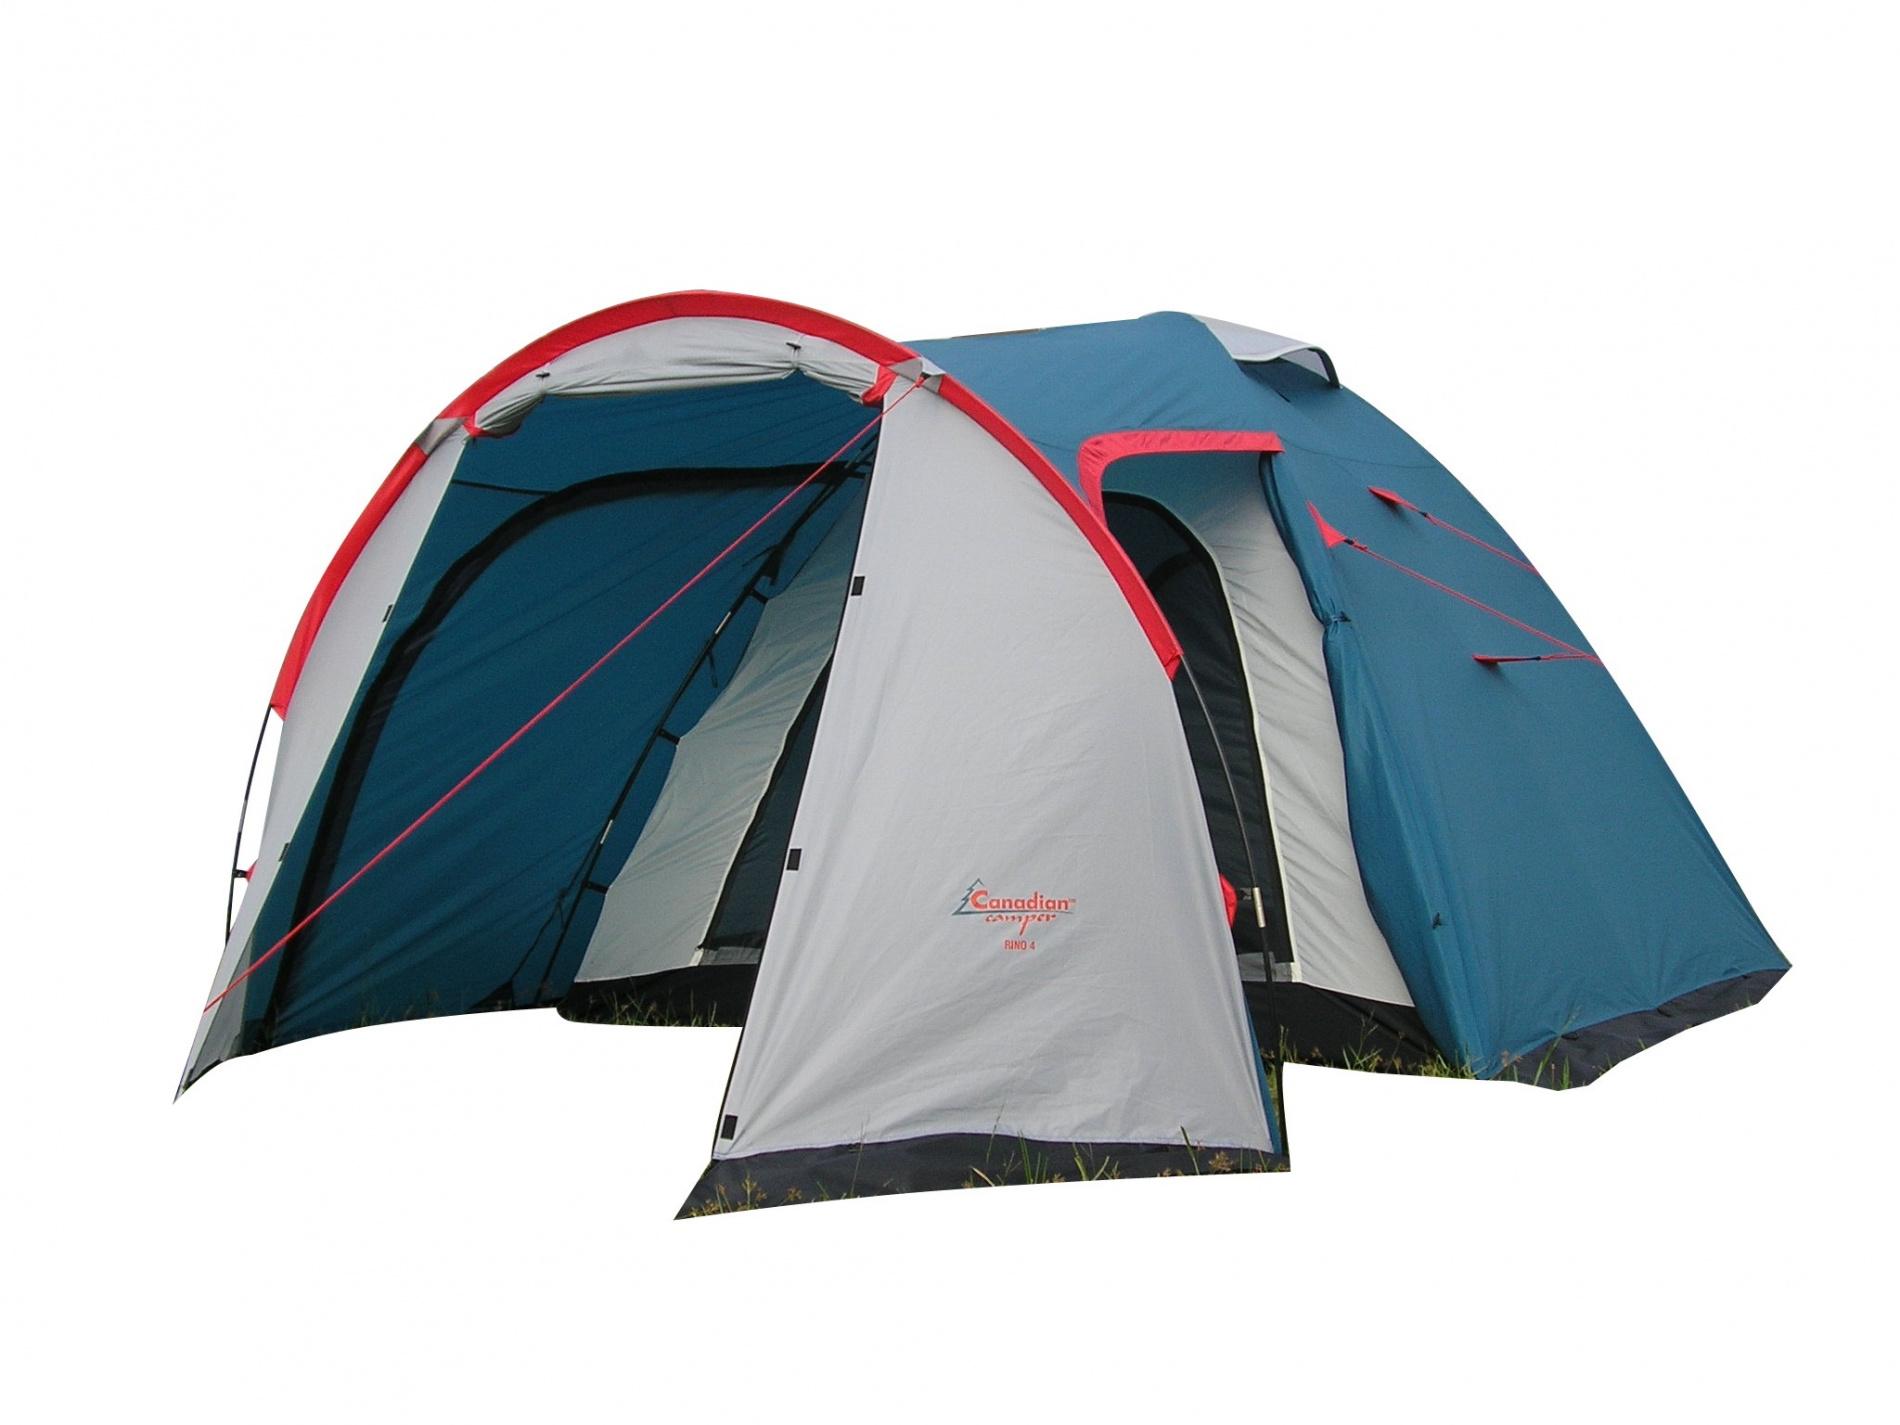 Палатка Canadian Camper RINO 2 (цвет royal дуги 8,5 мм) палатка canadian camper tanga 3 royal